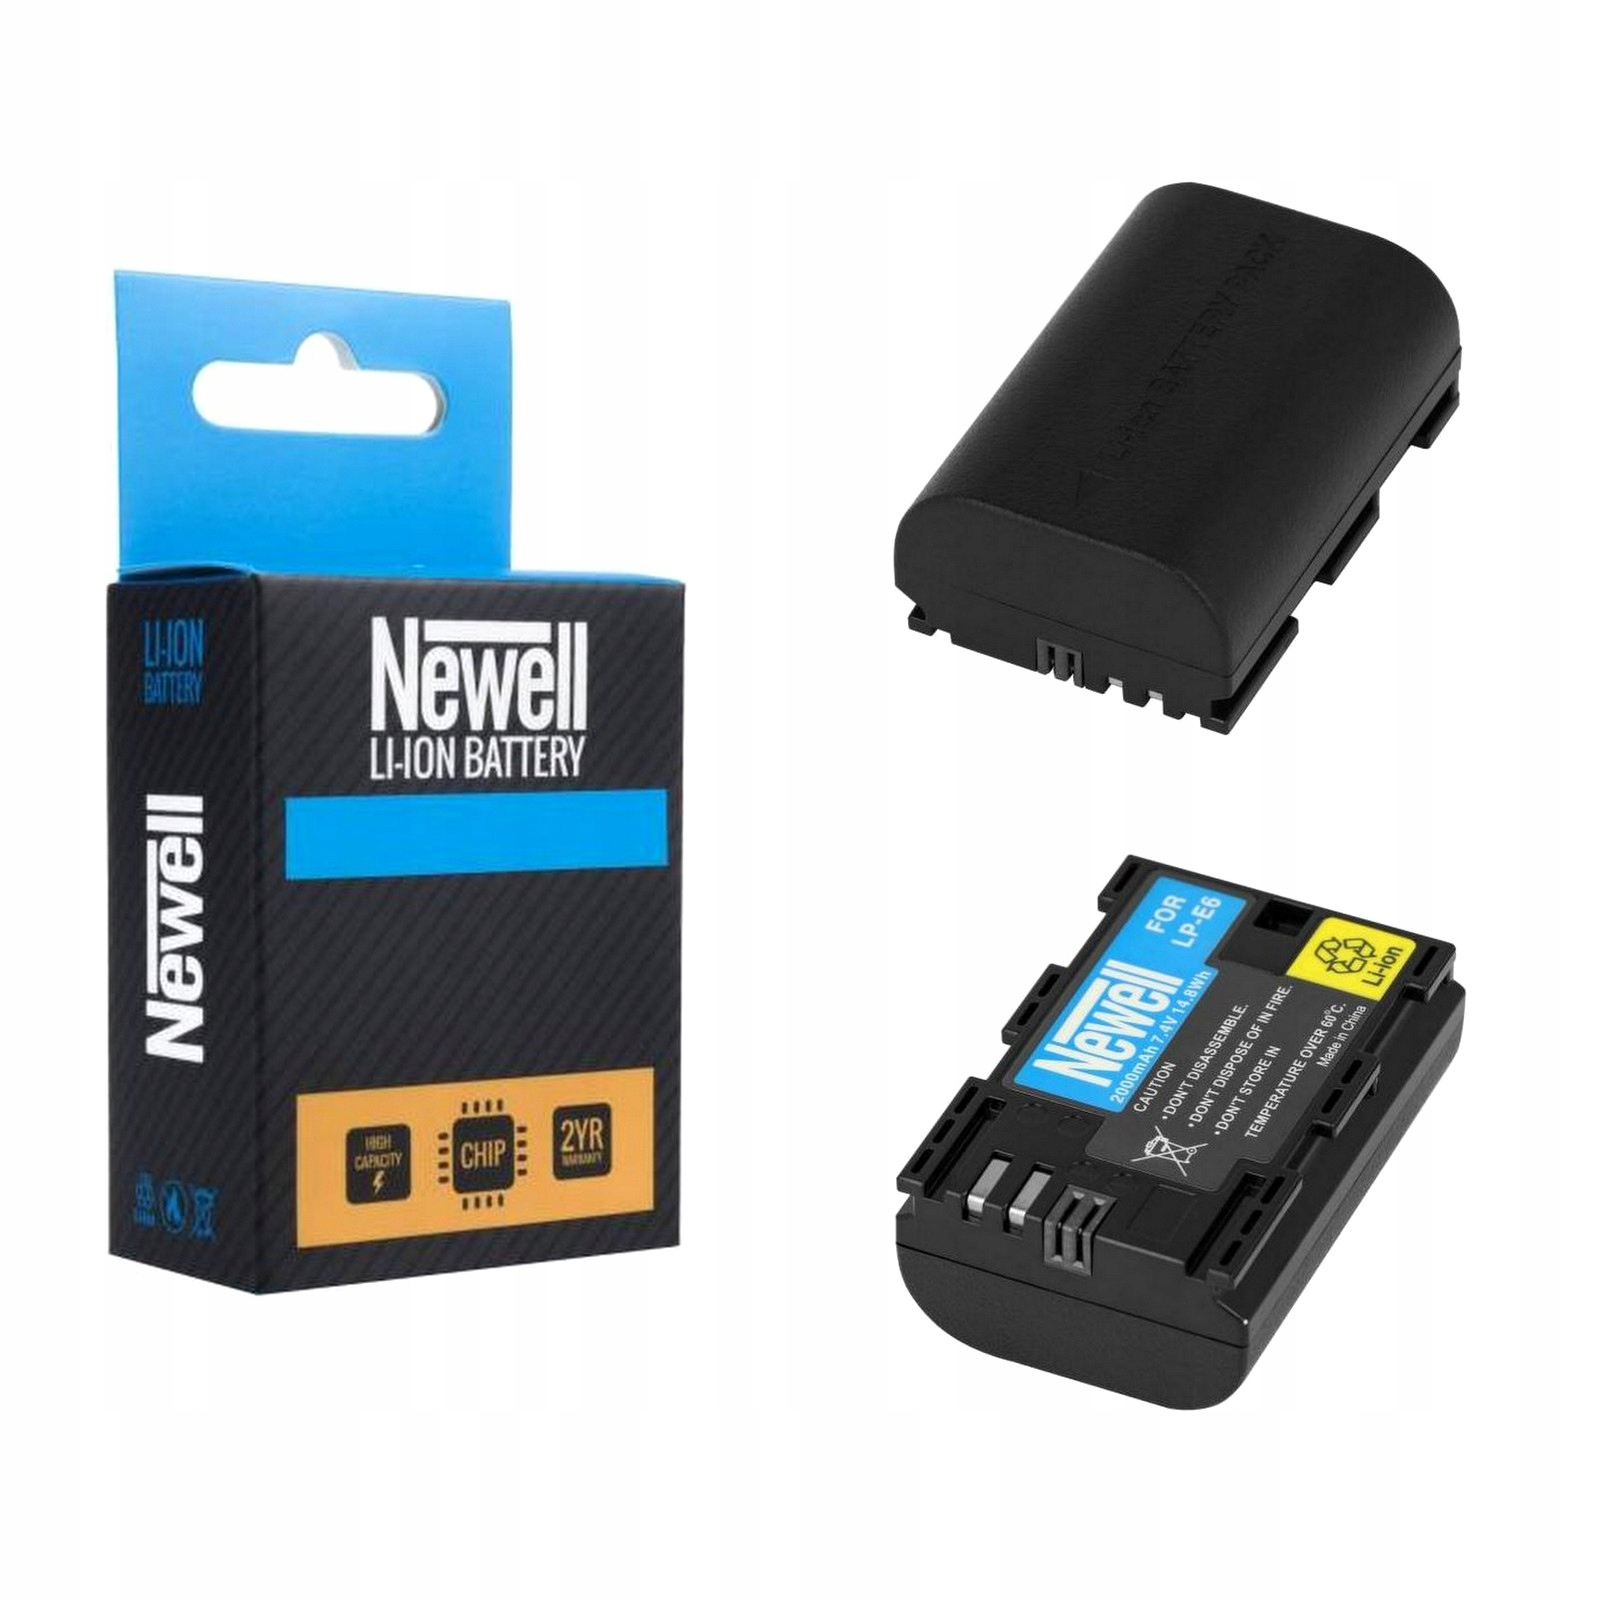 Item Battery NEWELL for CANON LP-E6 LP-E6N